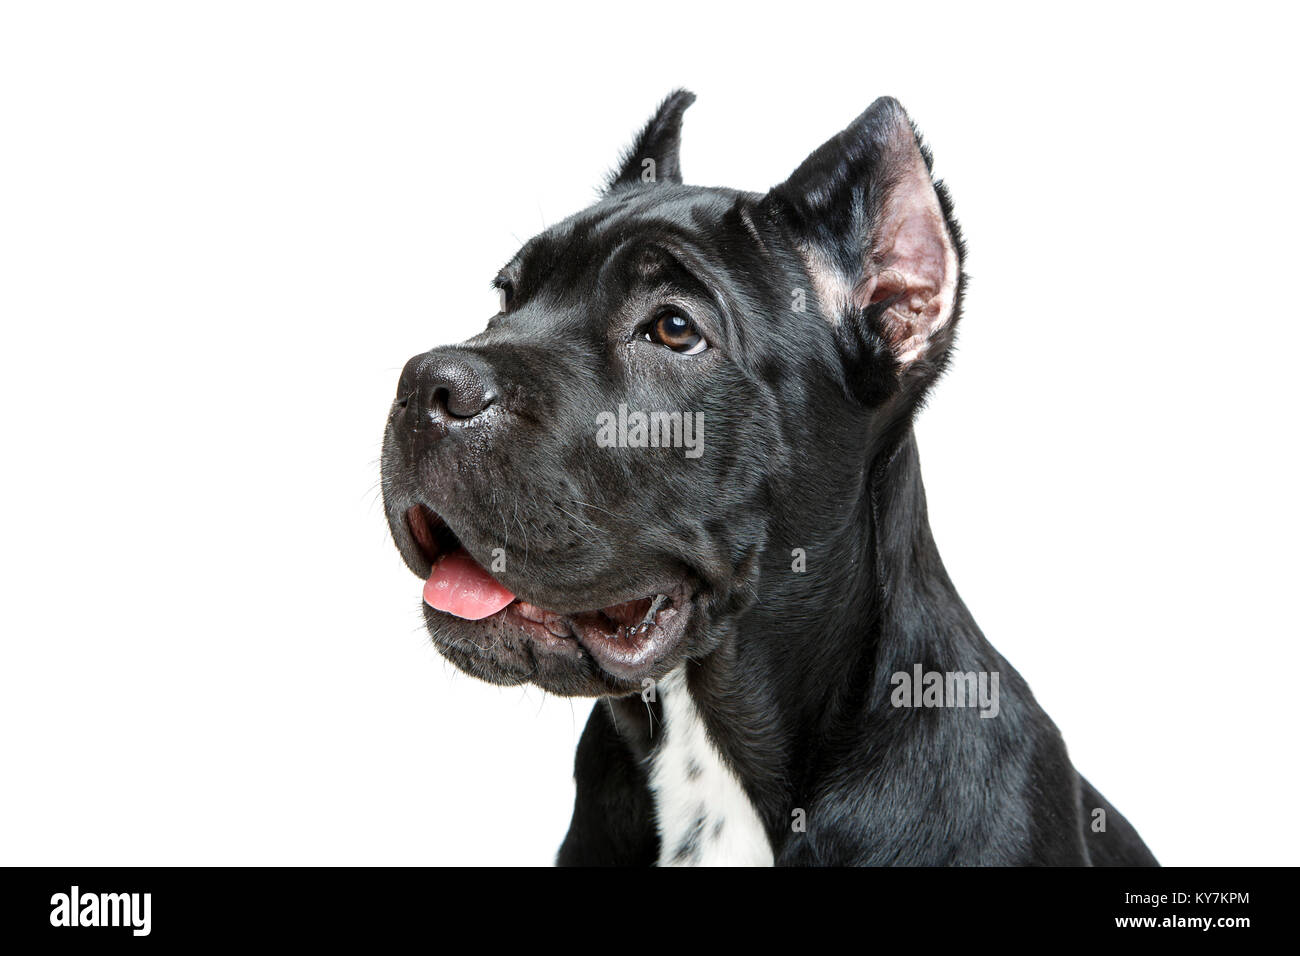 Beautiful Cane Corso Puppy Isolted On White Background Female Stock Photo Alamy